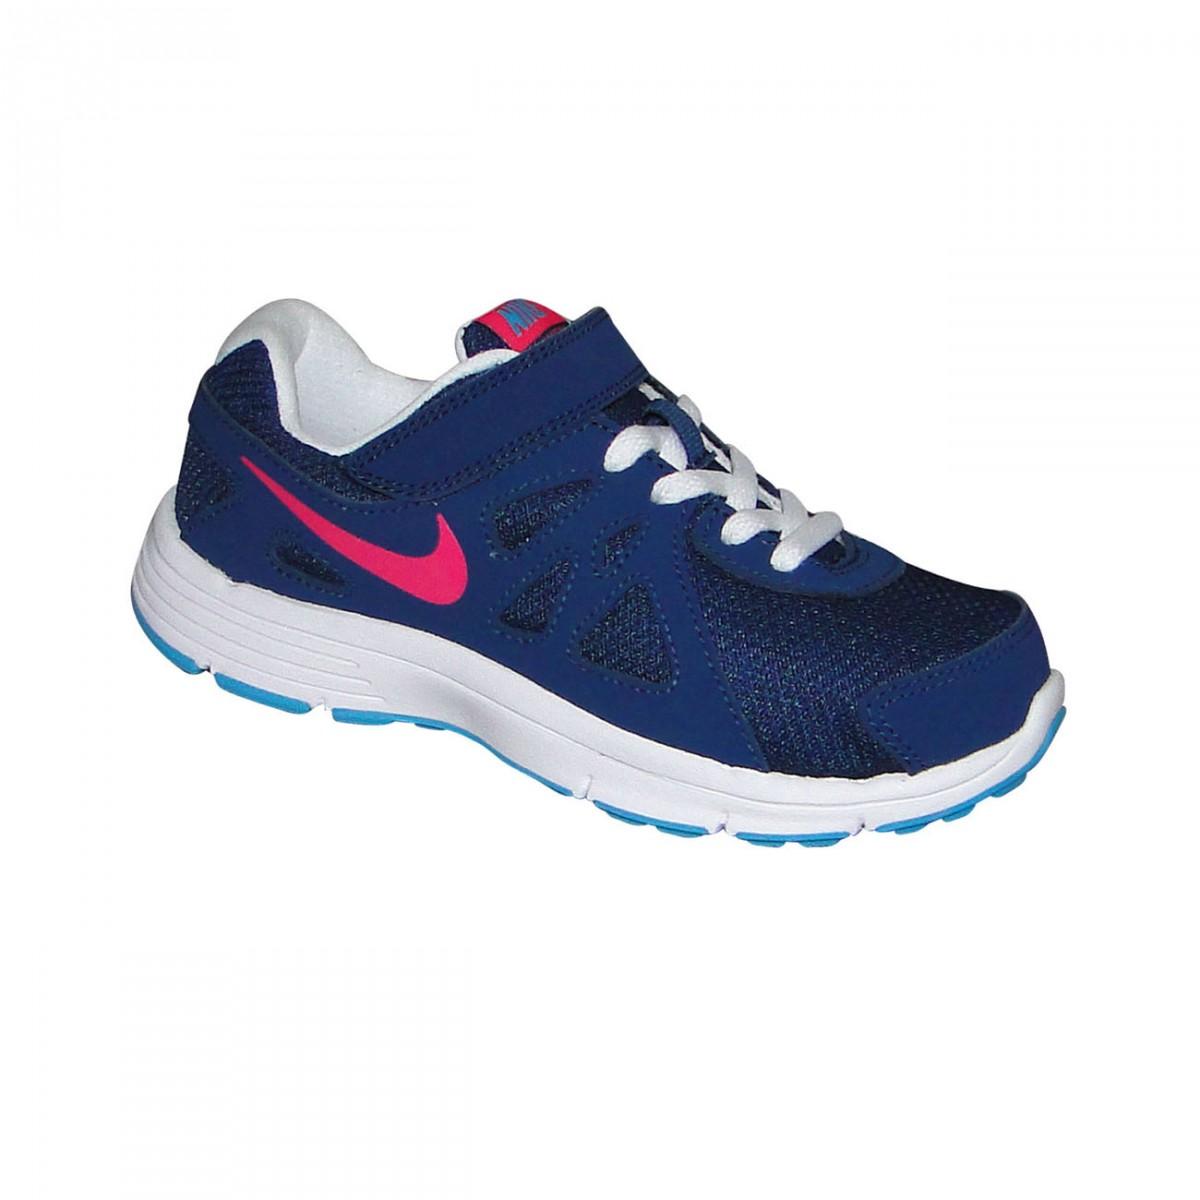 0faaa5451464e Tenis Nike Revolution 2 Infantil 555091 400 - Marinho Branco Pink -  Chuteira Nike